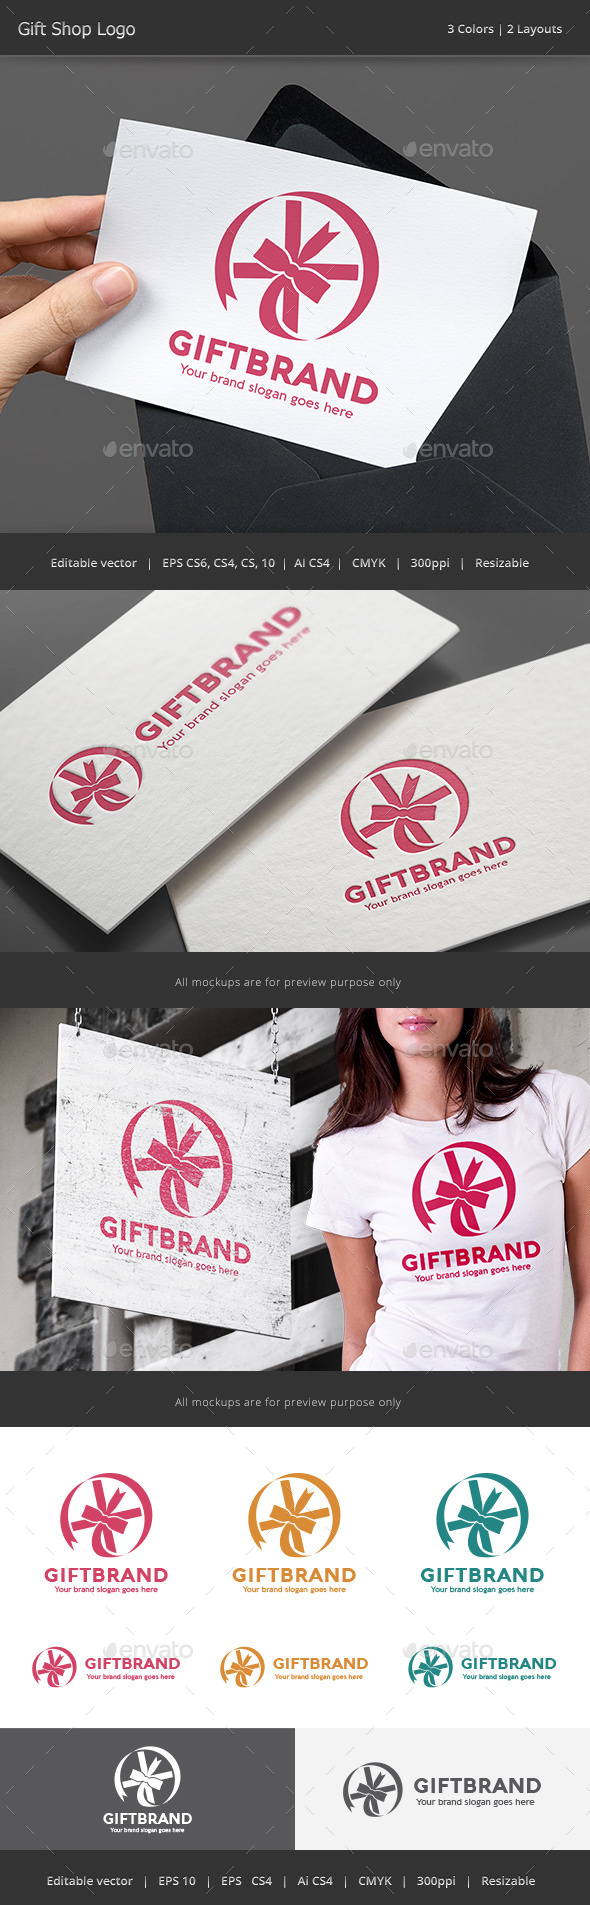 Gift Brand Logo - Objects Logo Templates